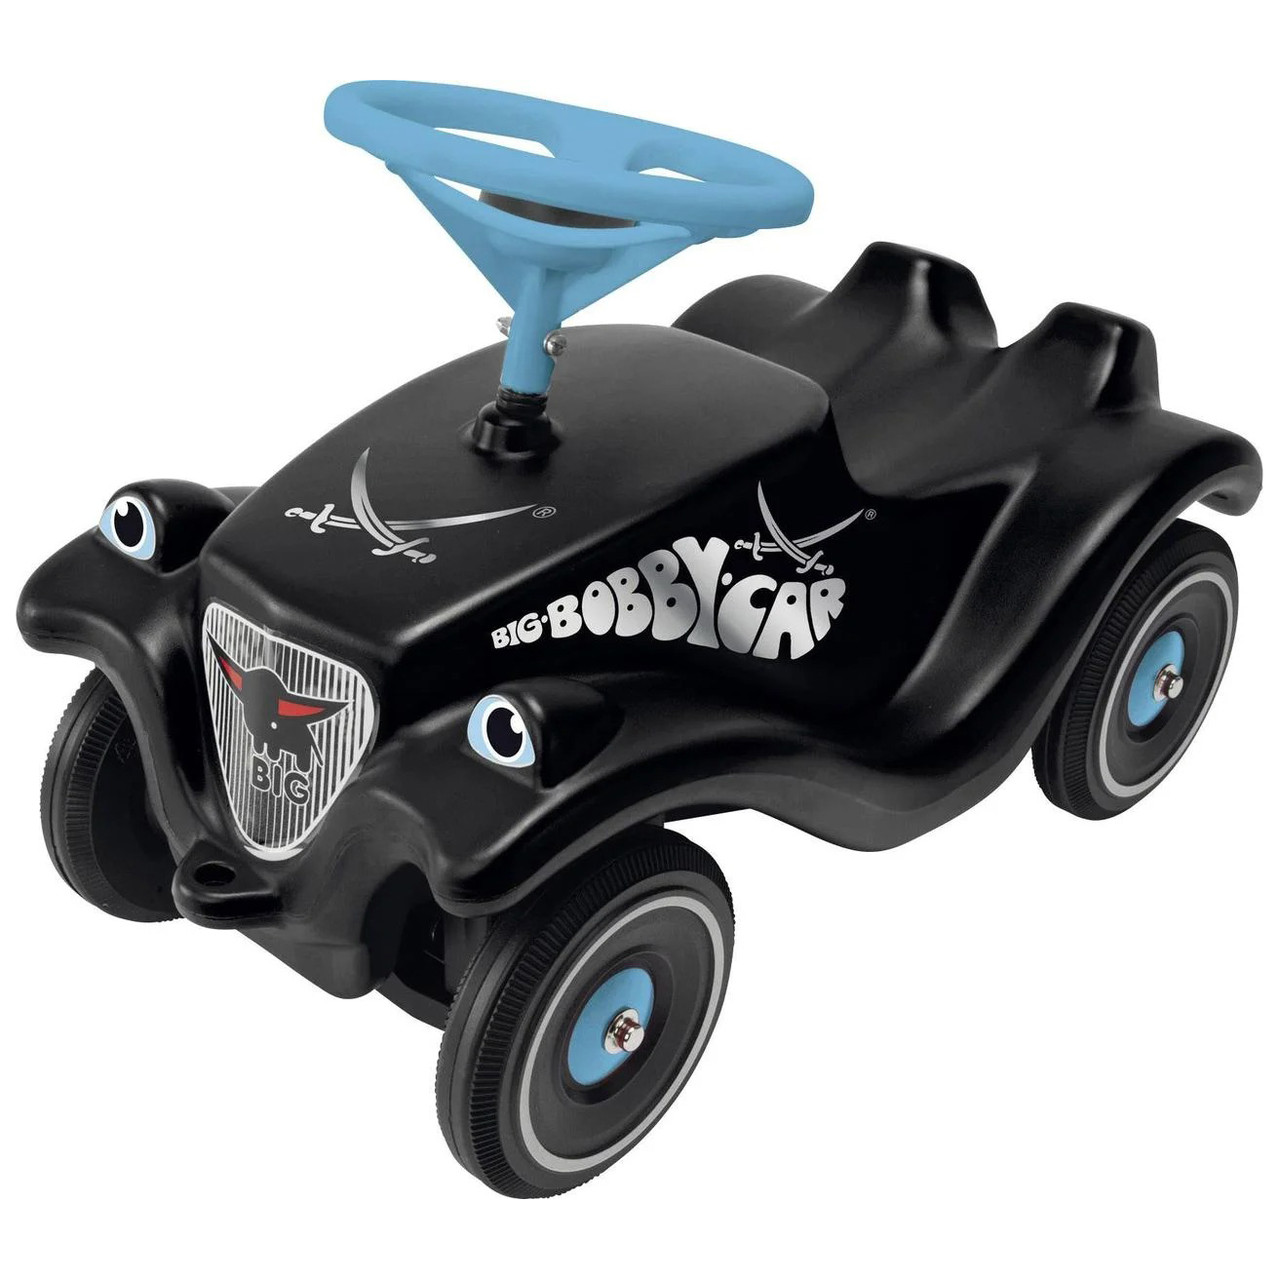 Дитяча машинка каталка Bobby Car Classic Sansibar Big толокар для дітей